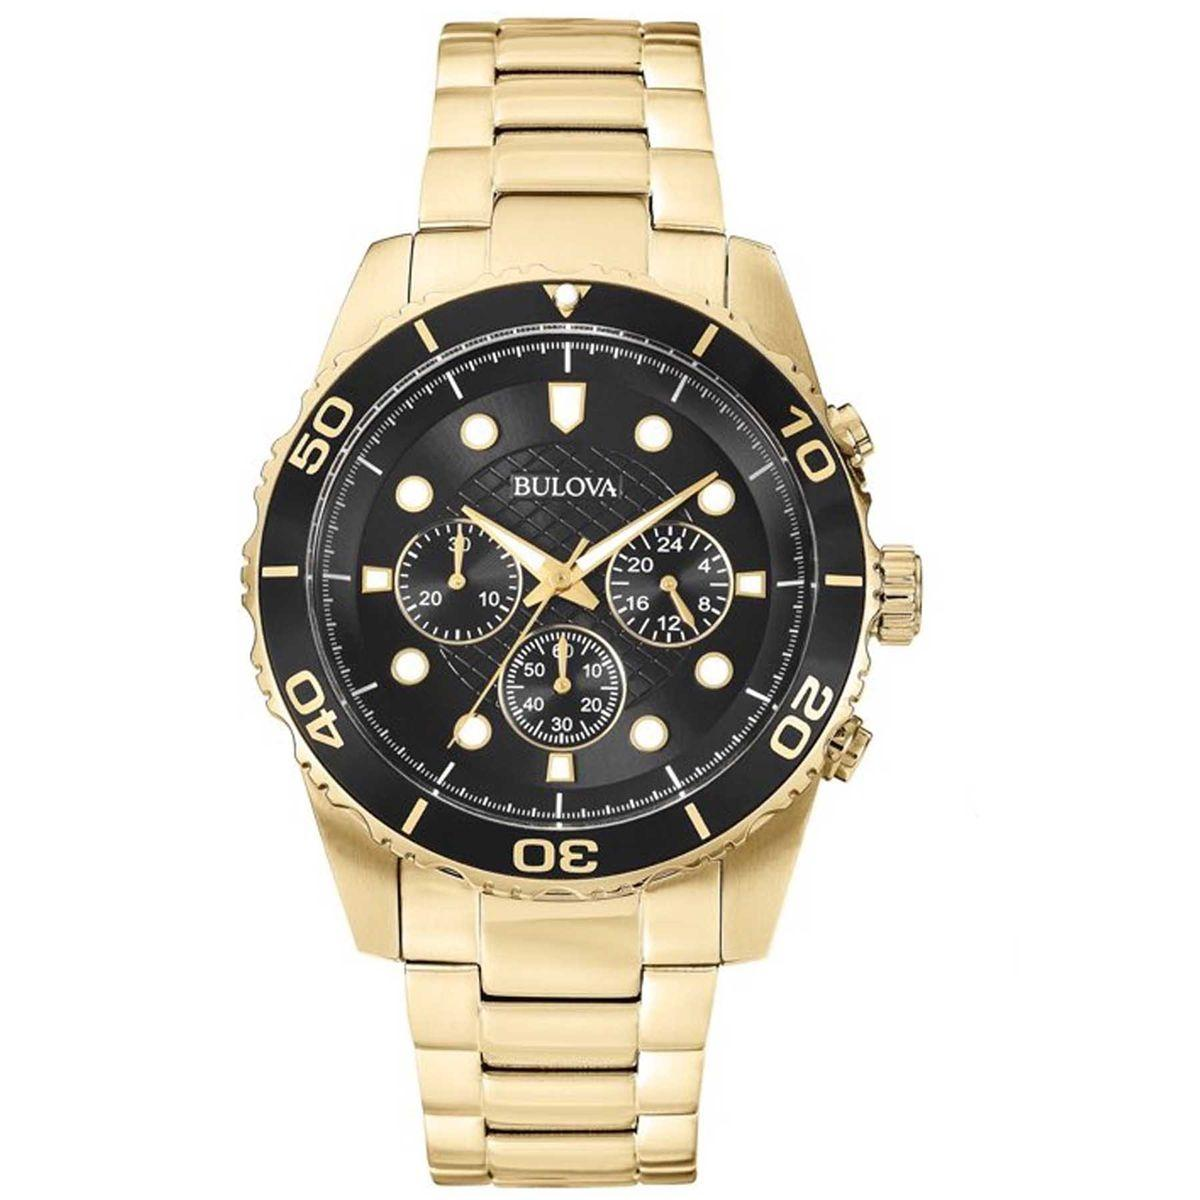 ac8c62d5566 Relógio Bulova Cronógrafo Marine Star Analógico Masculino WB31989U - 98A173  R  2.058